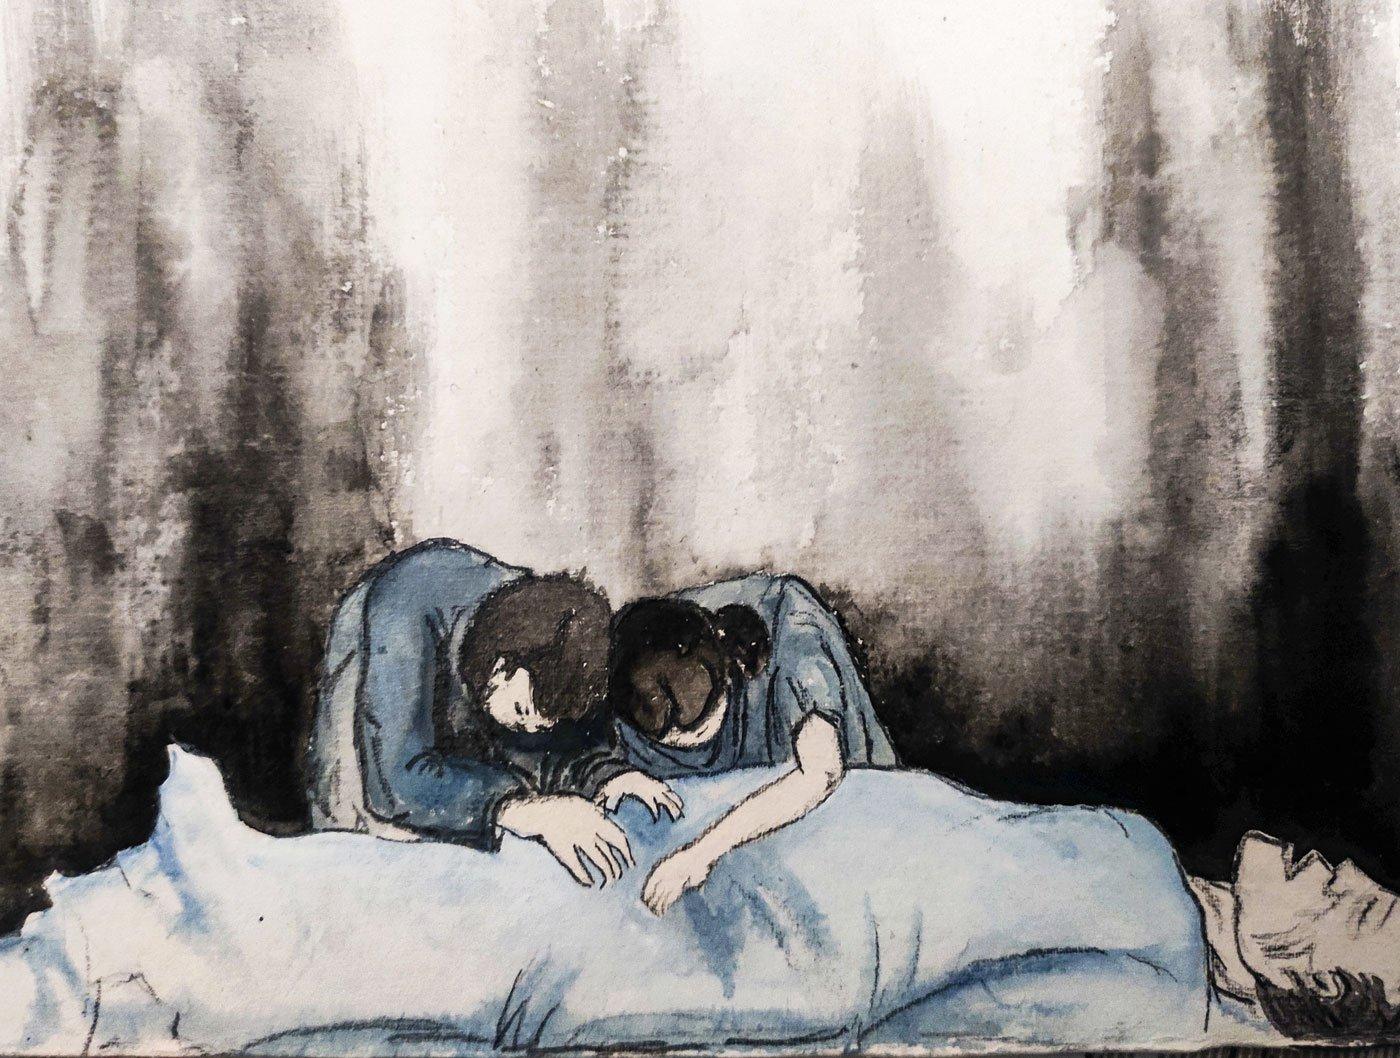 Tasleem tasleem in a poor man's cloud —Drop a pin, tahsin, like a sanitary shroud.